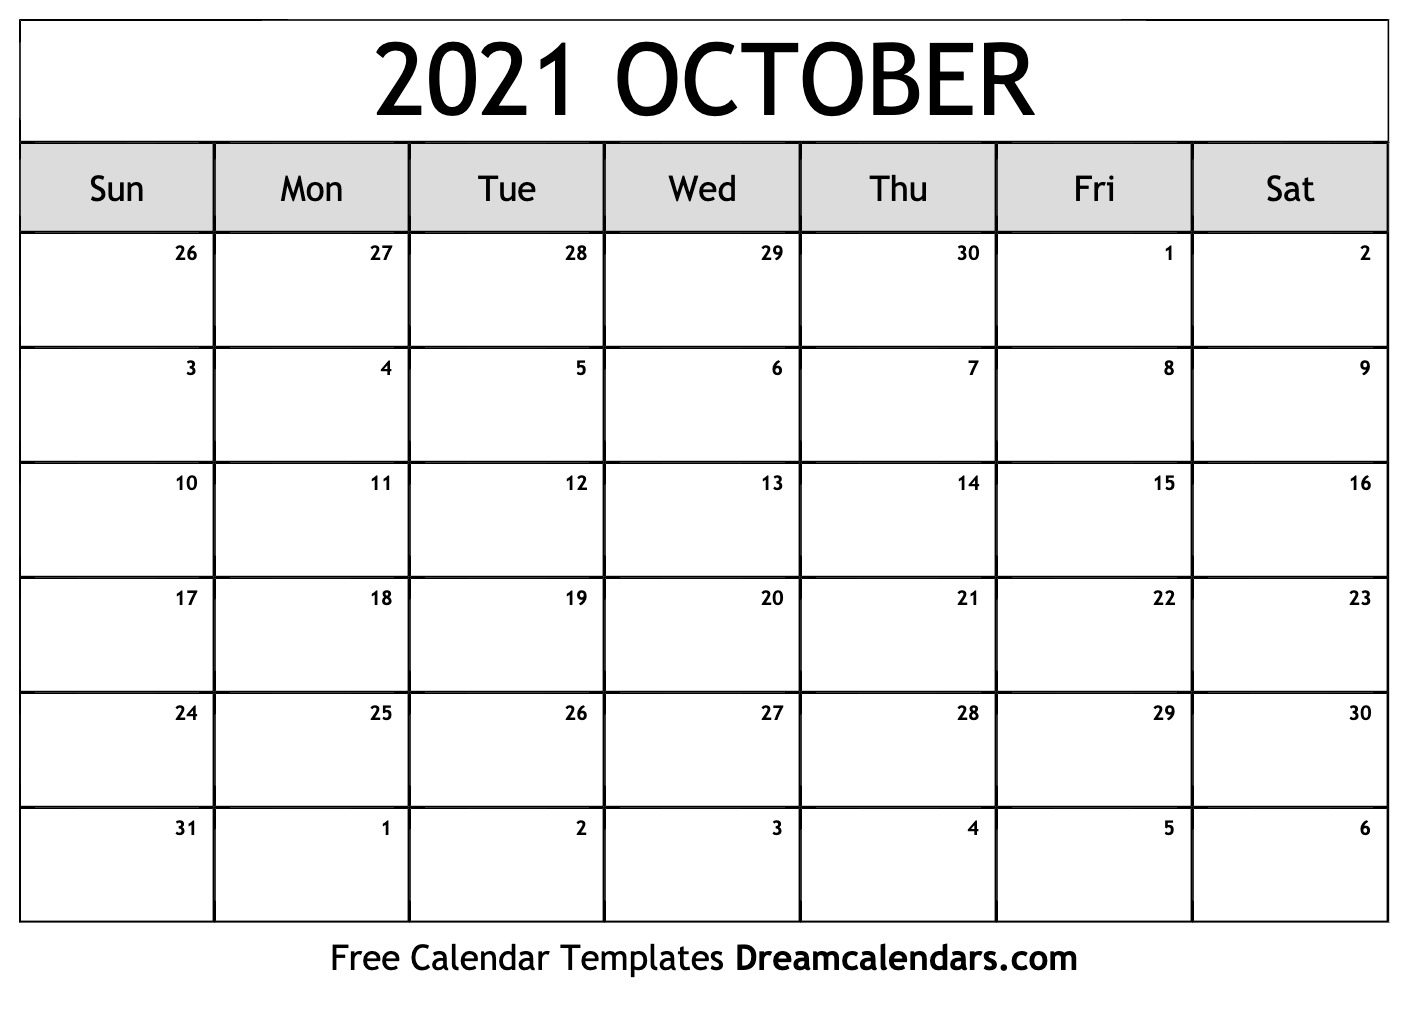 October 27 2021 Calendar Printable October 2021 Calendar